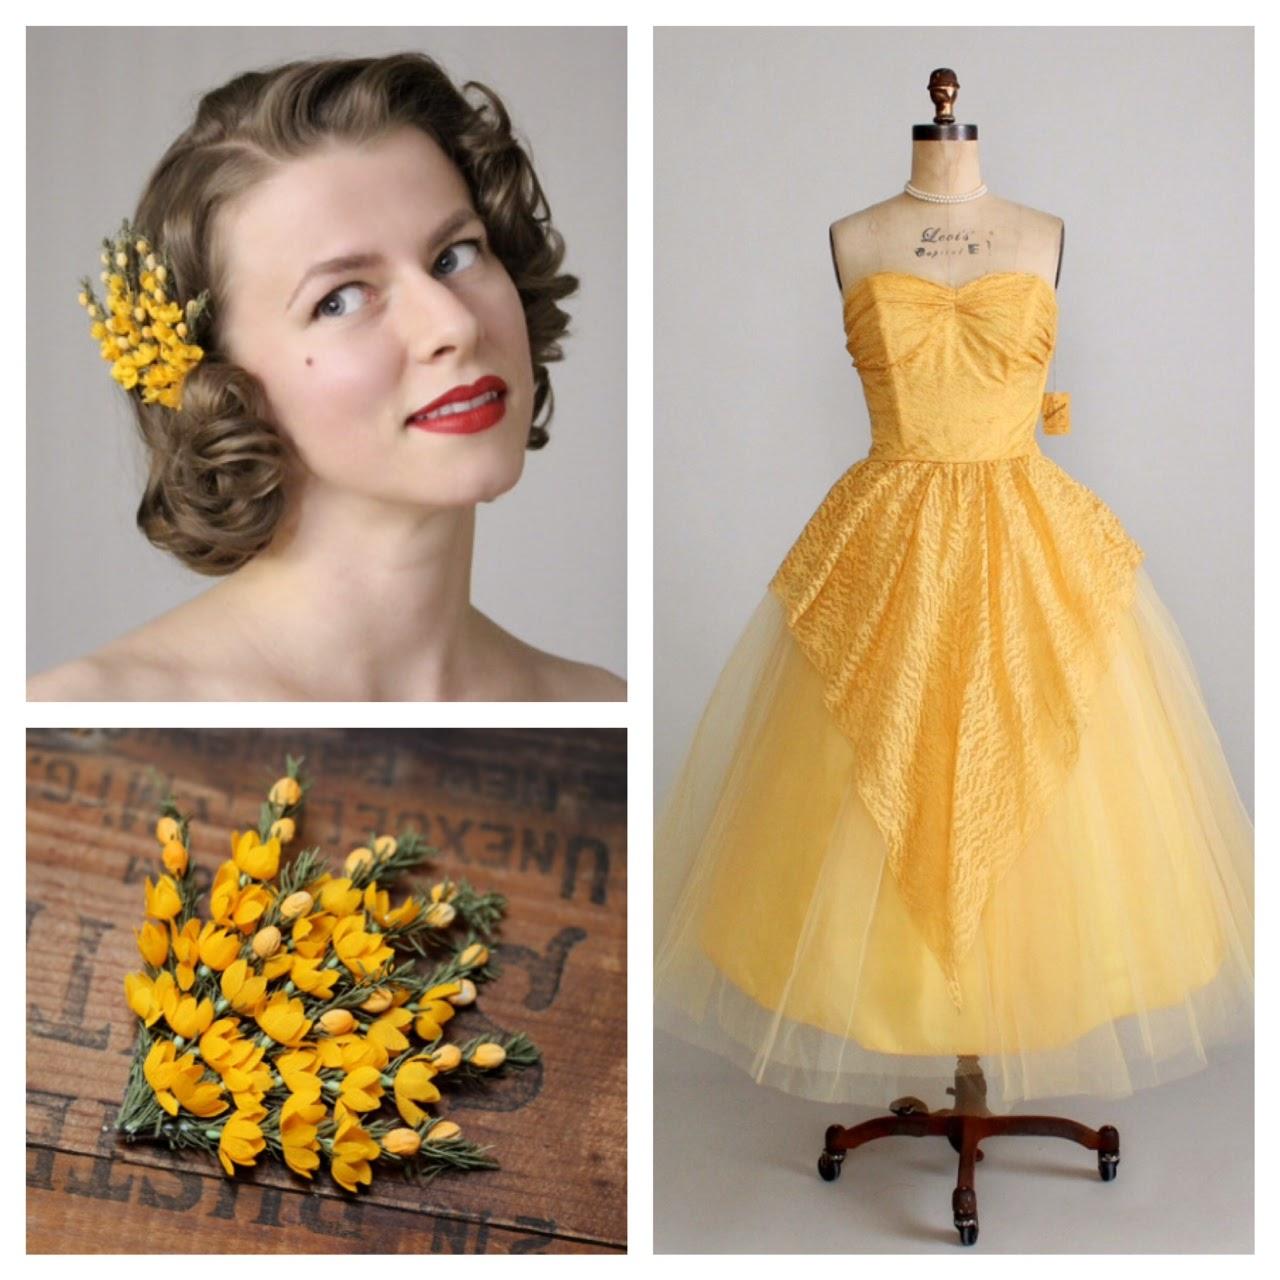 Saffron Sunrise - 1950s golden dress pairing #1950s #dress #gold #saffron #yellow